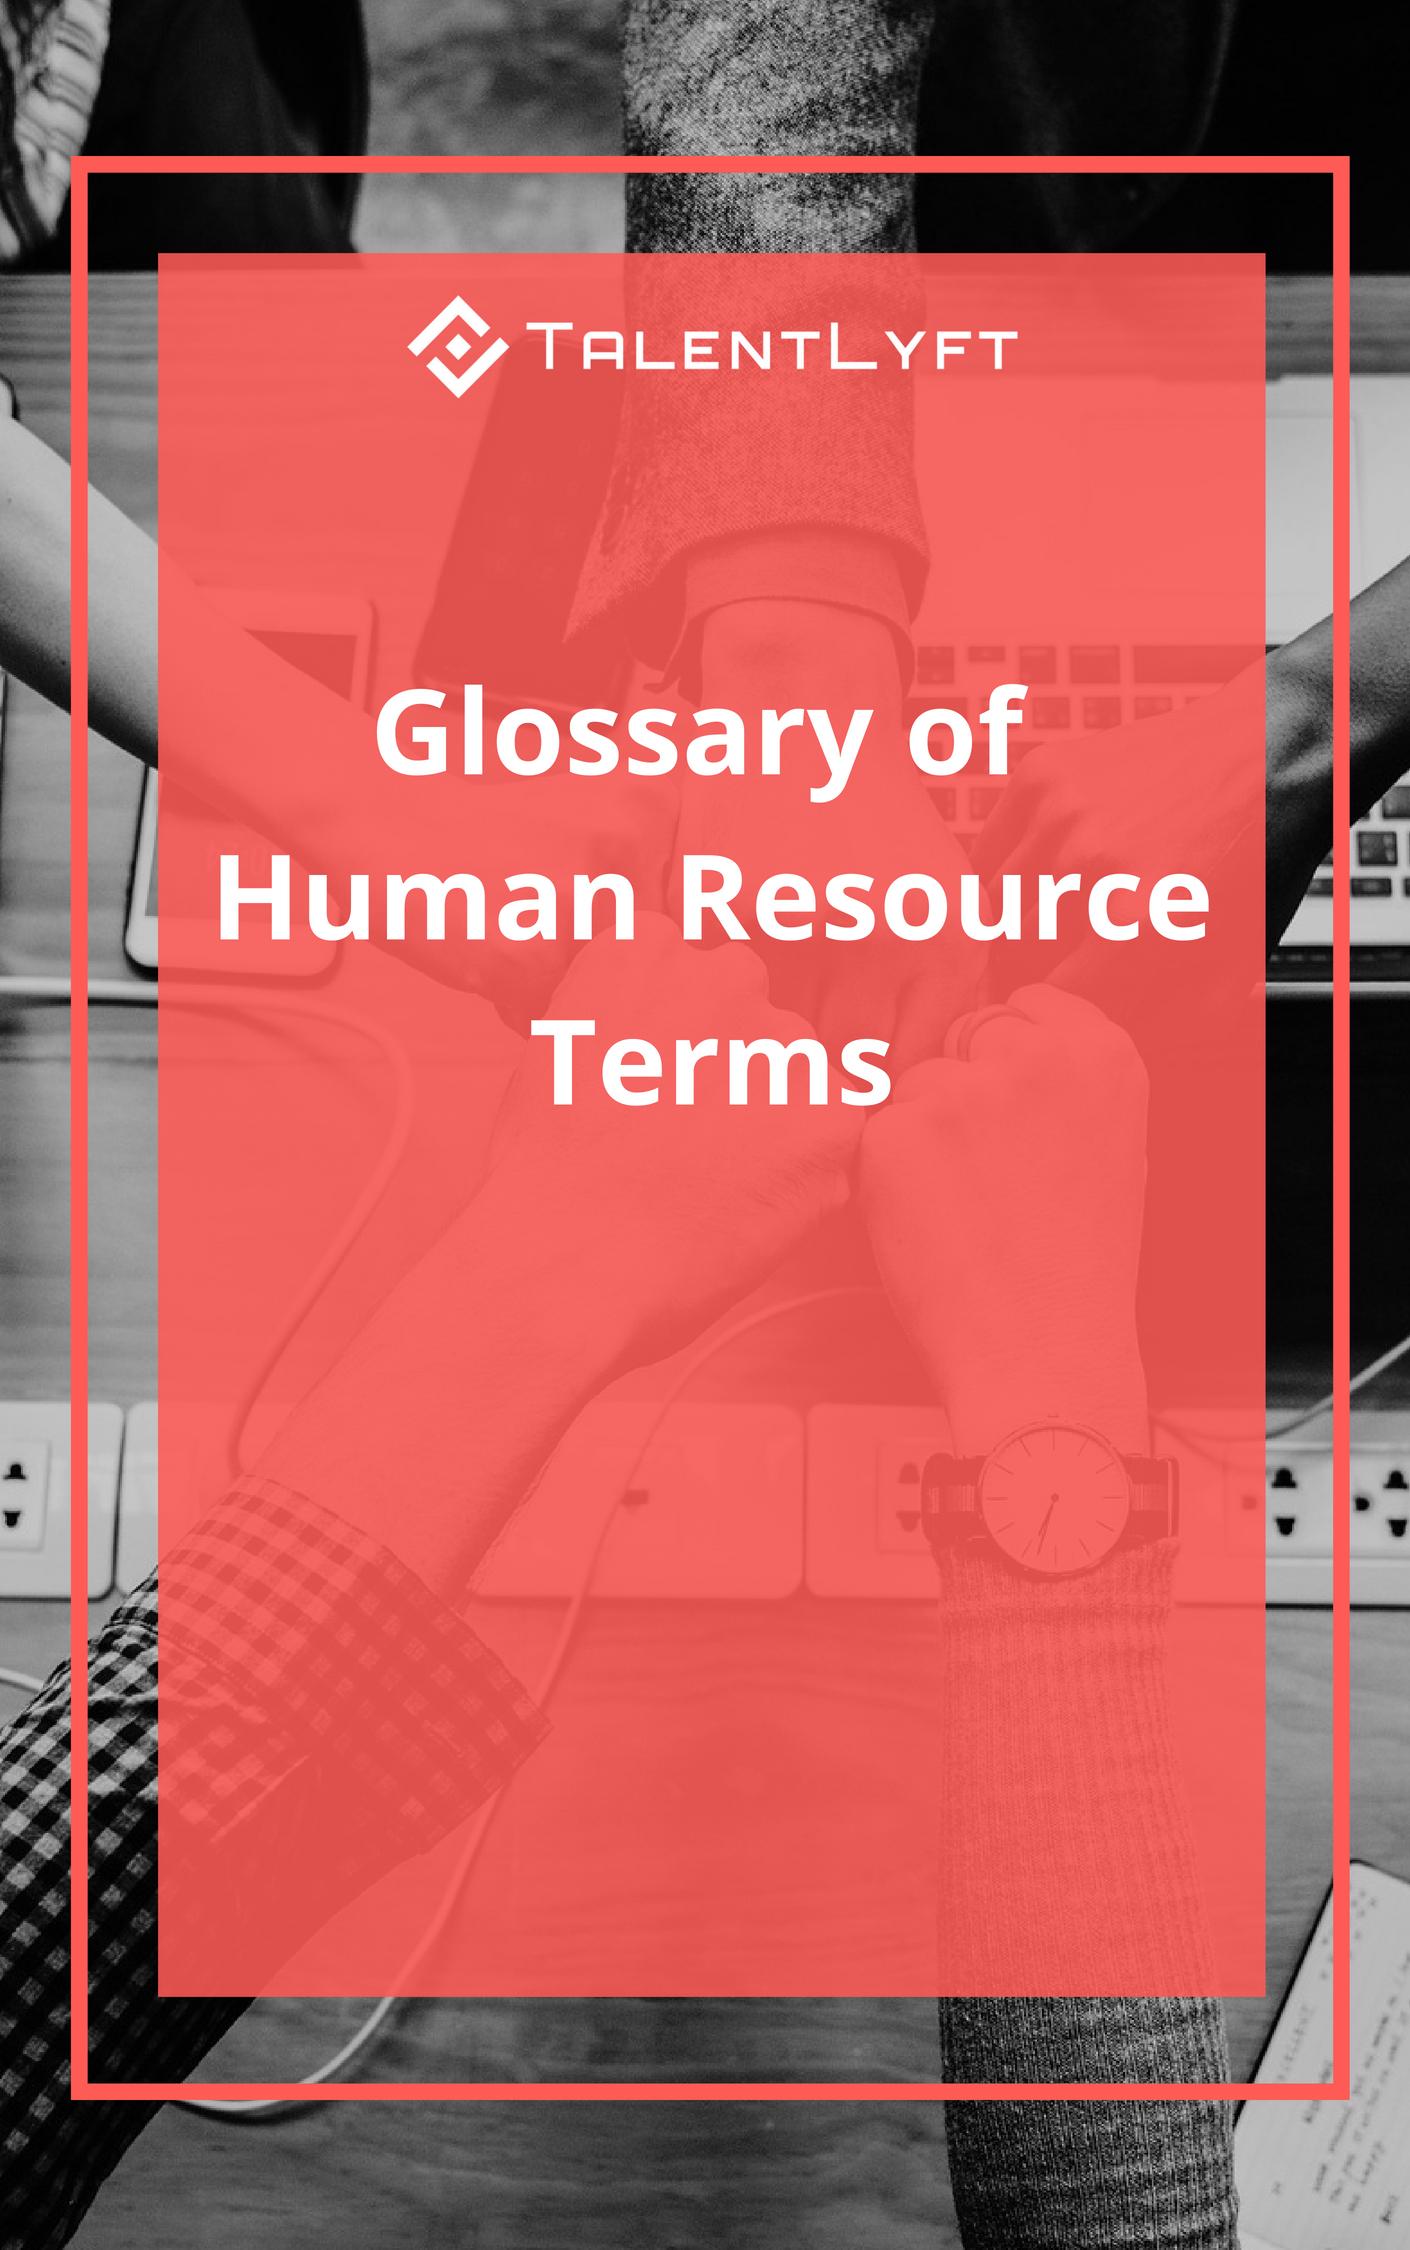 Glossary of Human Resource Terms.jpg